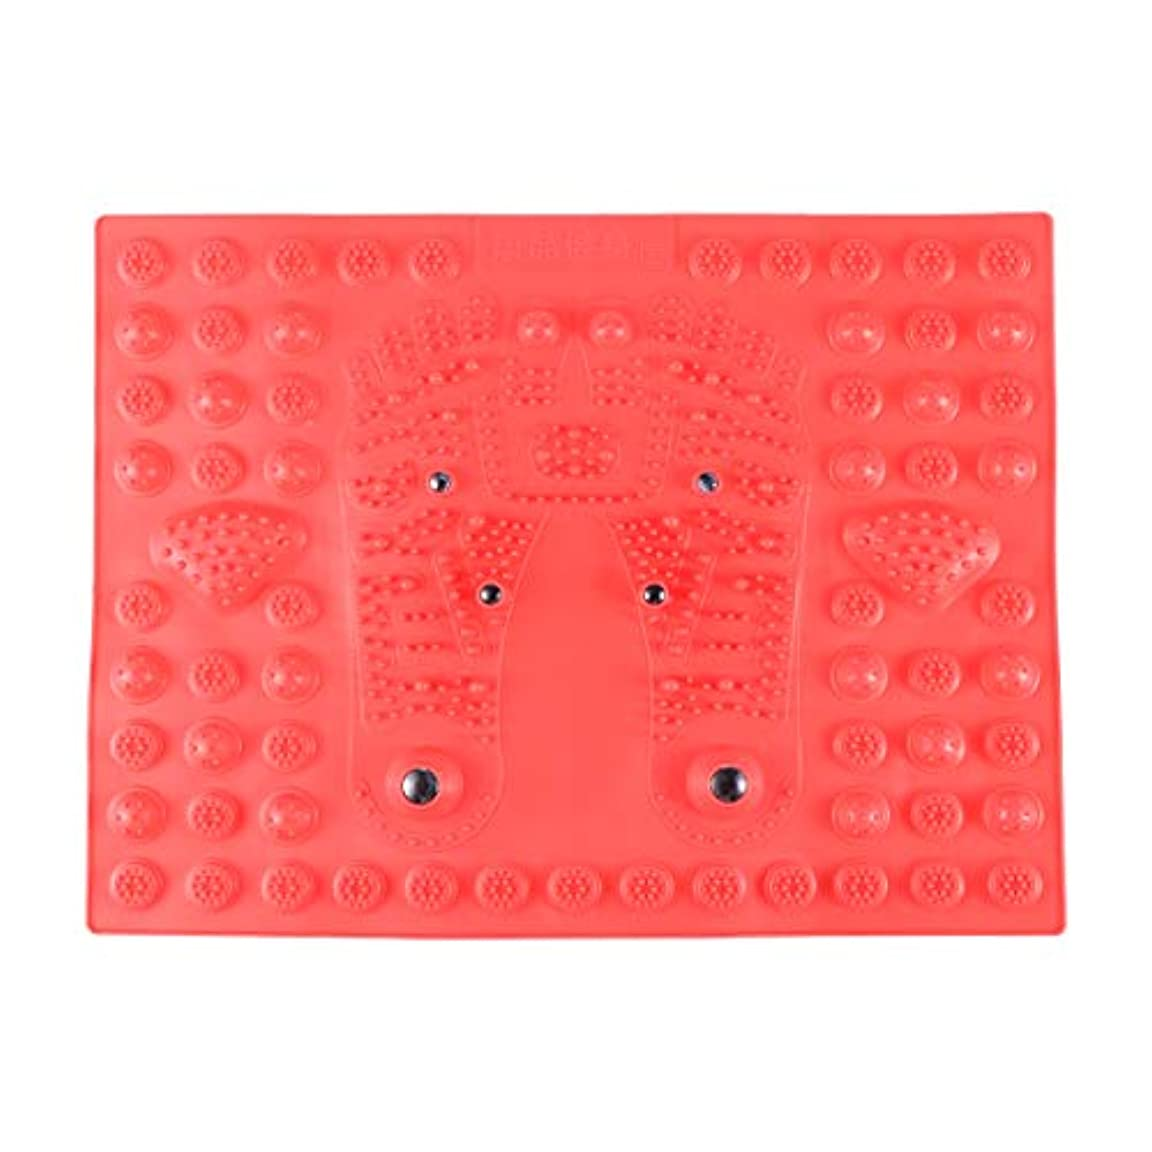 SUPVOX フットマッサージマット指圧リラクゼーションリフレクソロジーマット磁気療法フィートマット(レッド)